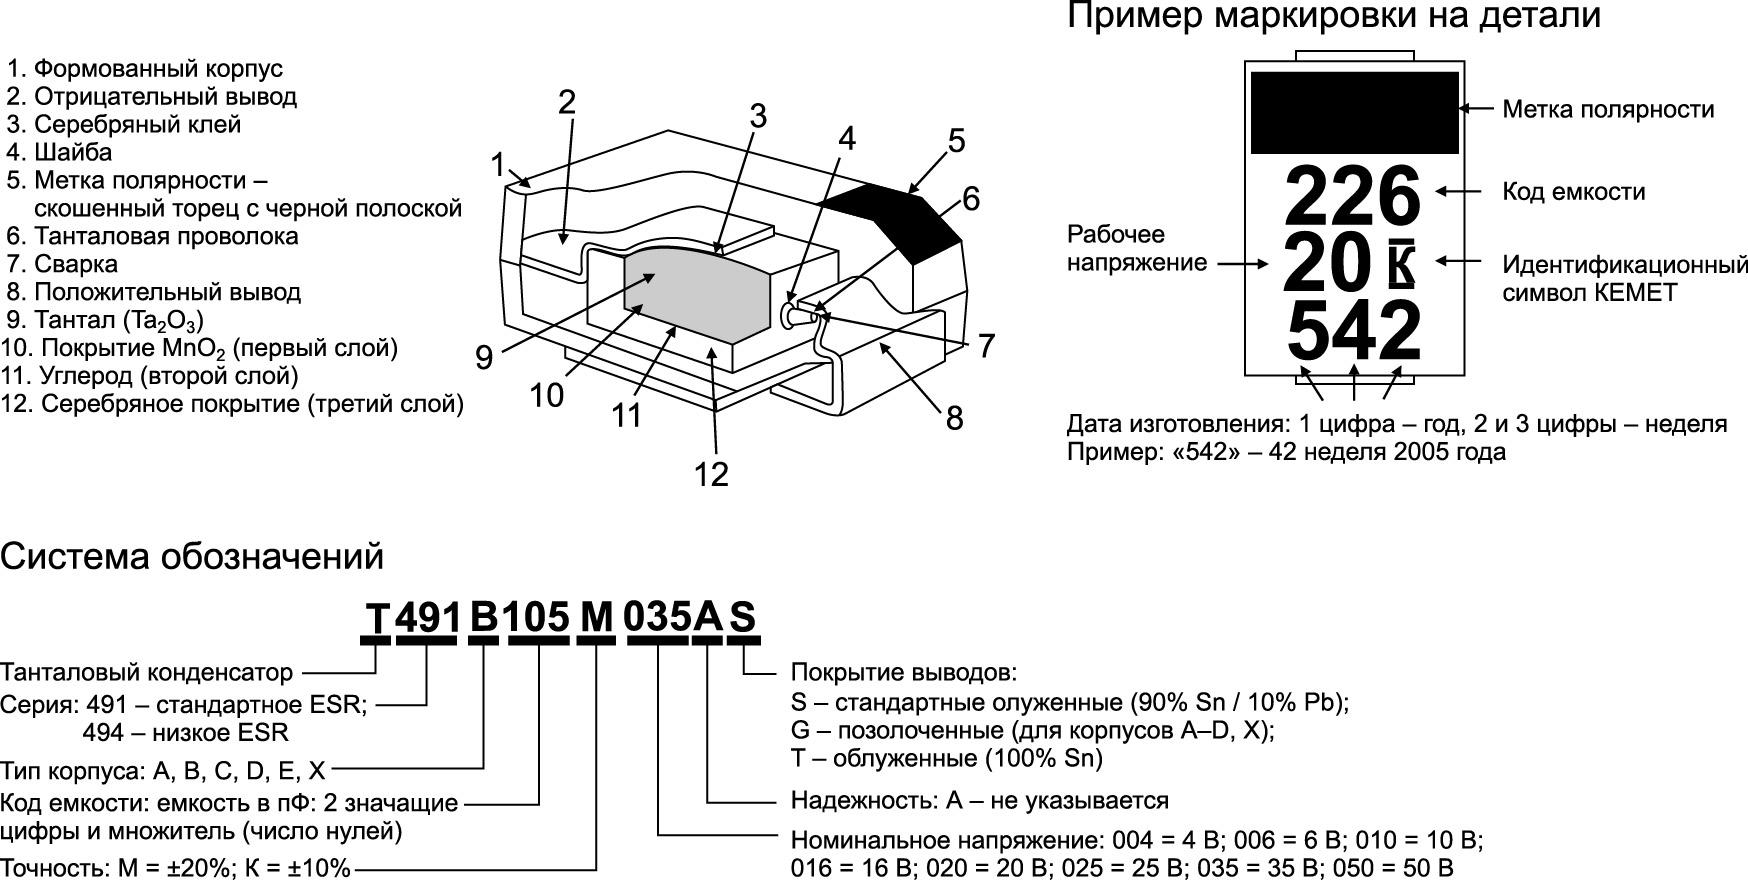 Маркировка и система обозначений танталового конденсатора для поверхностного монтажа